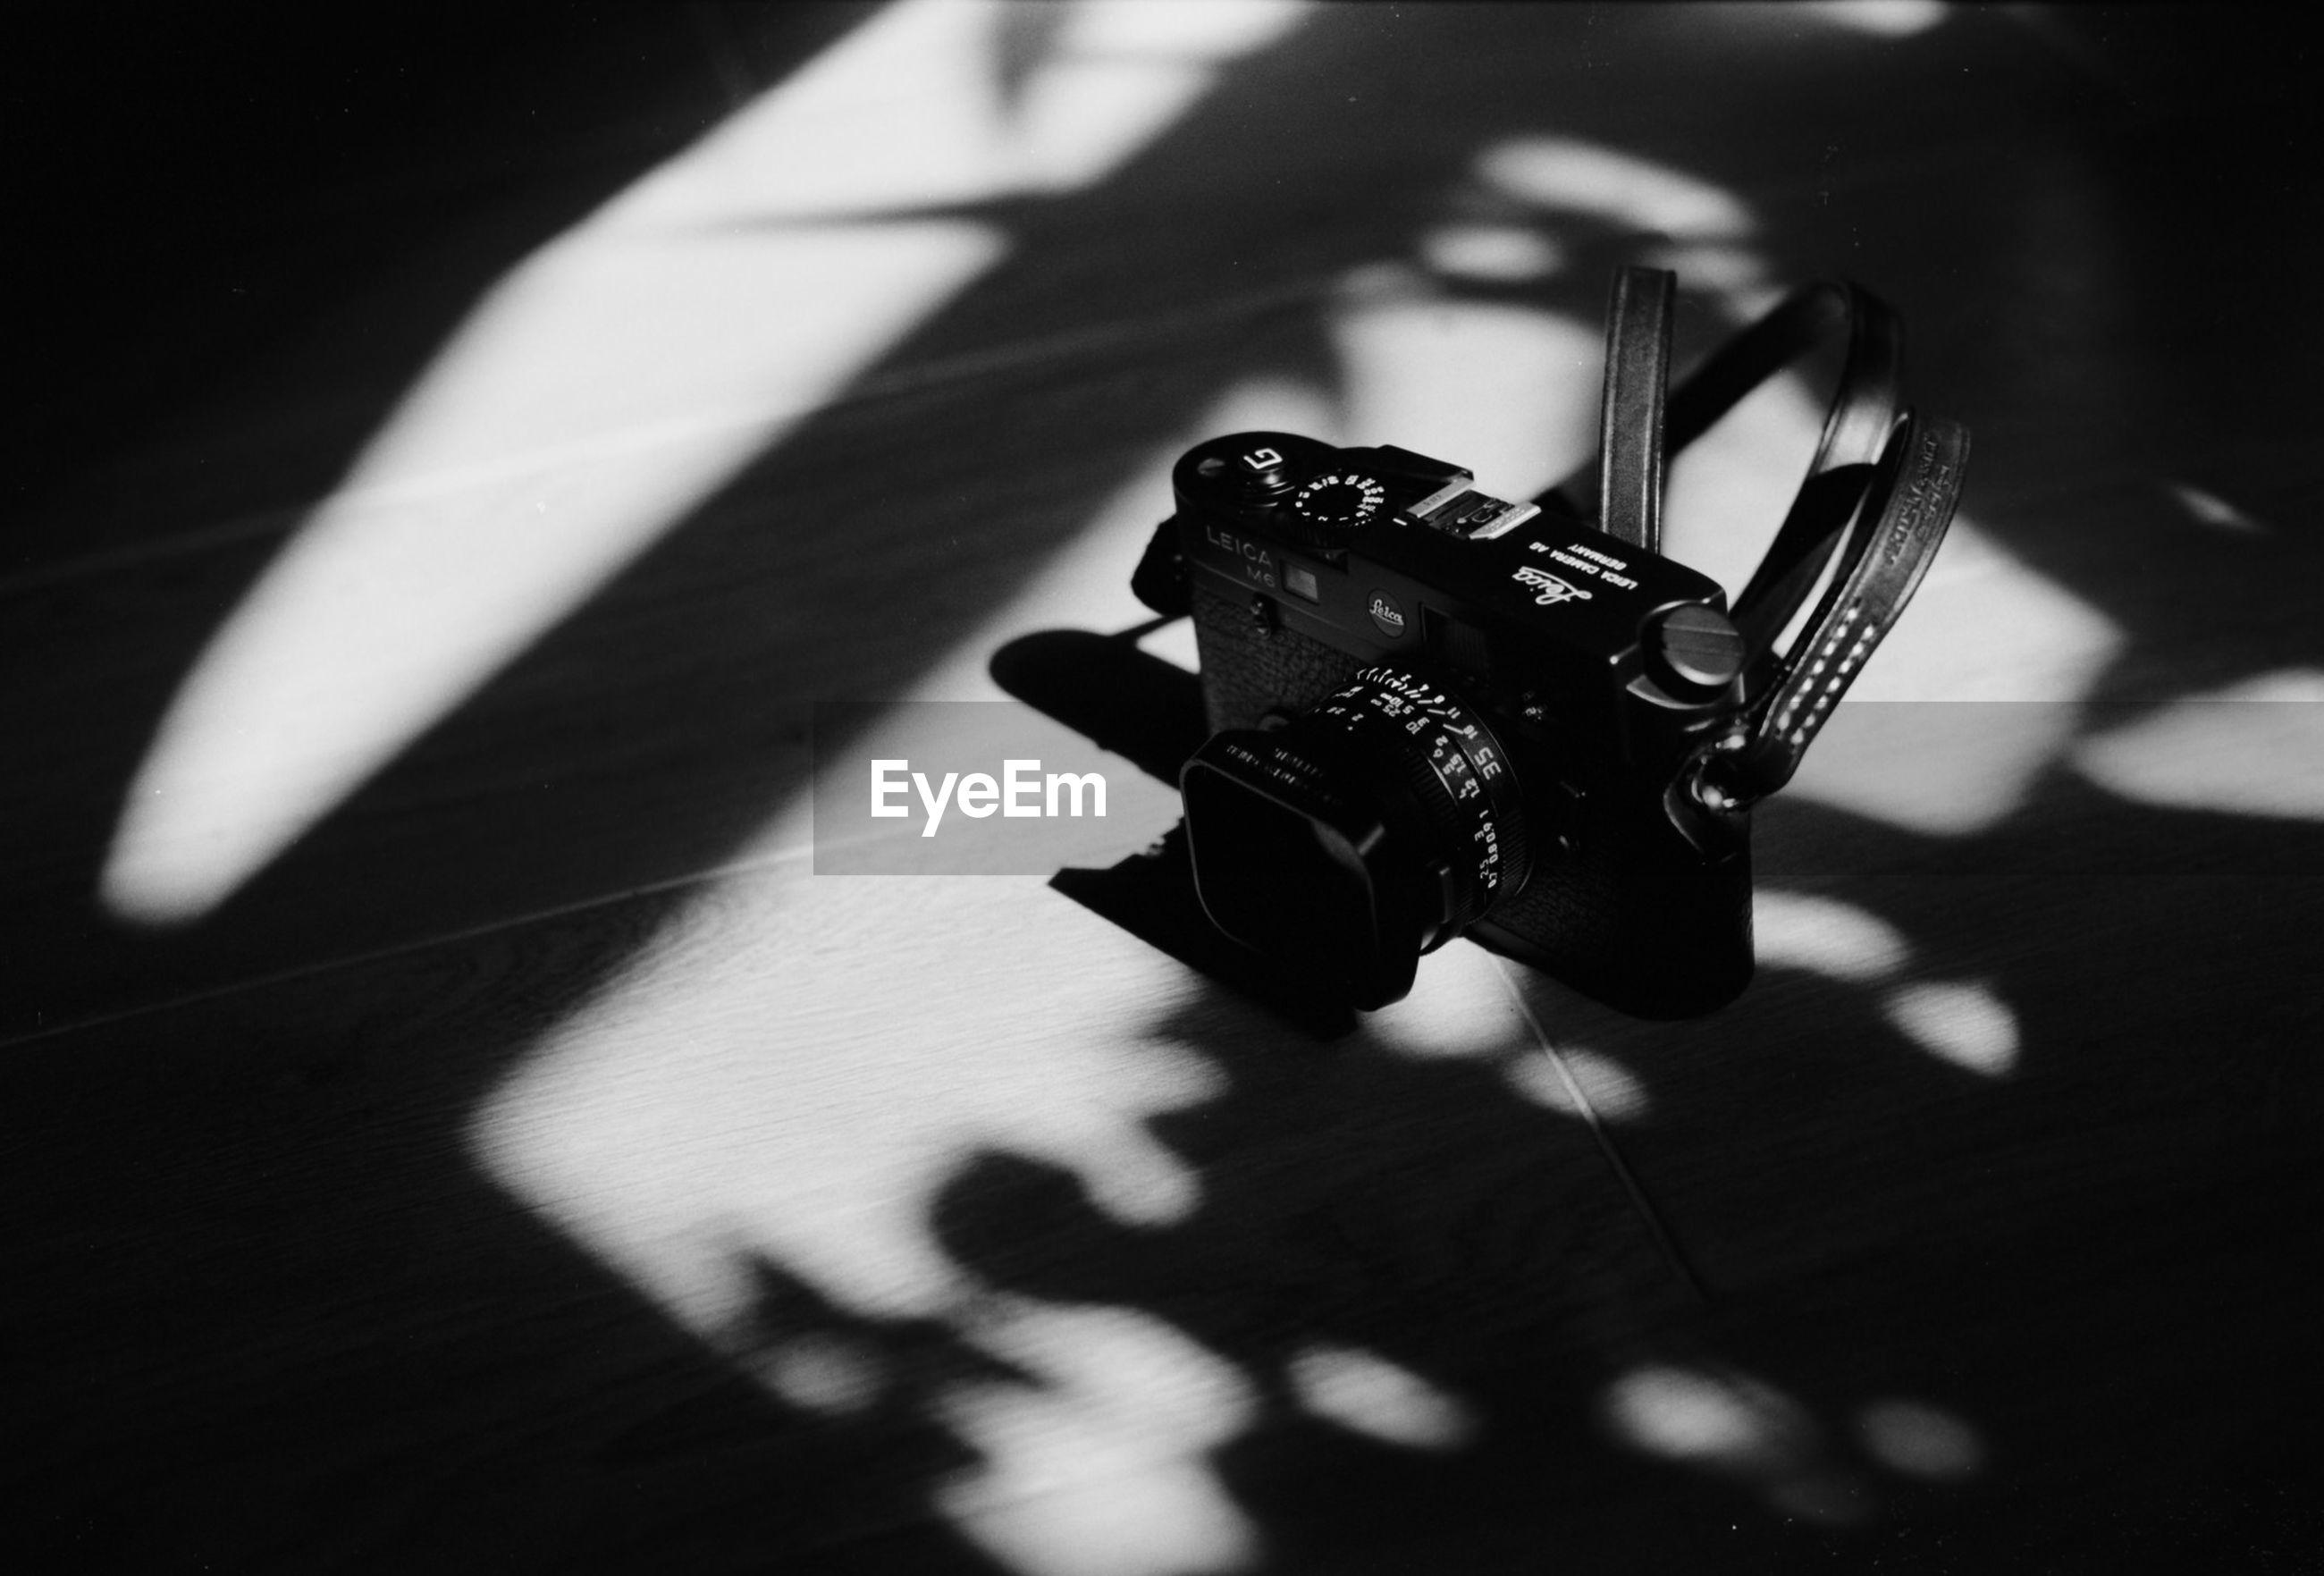 High angle view of camera on hardwood floor